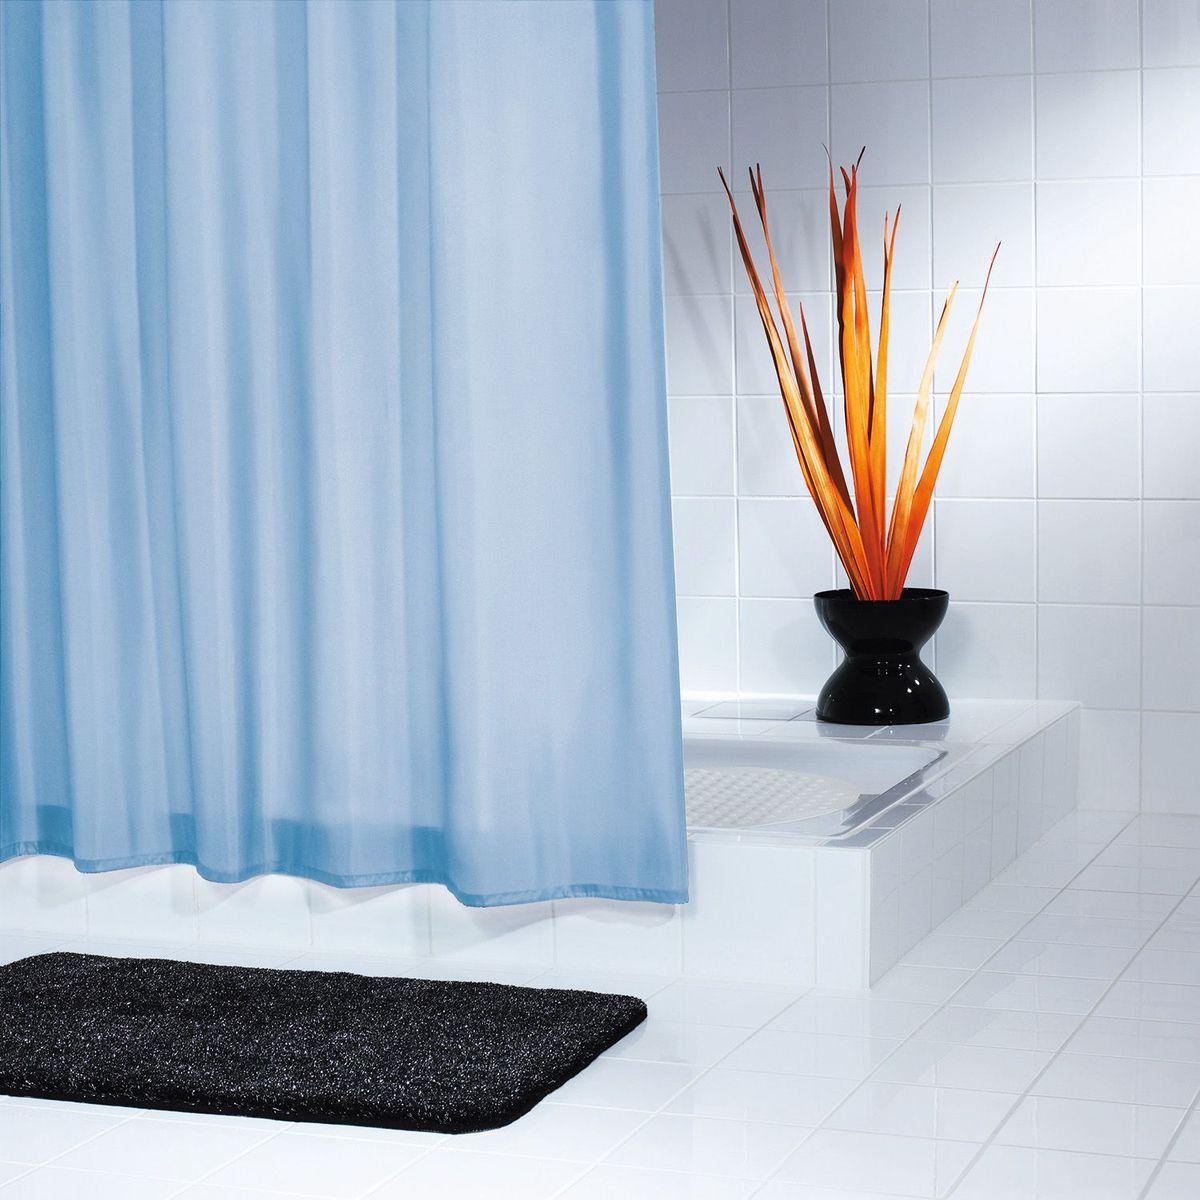 Штора для ванной комнаты Ridder Uni, цвет: голубой, 180 х 200 см салфетка pvc uni 28x40 cm овал беж